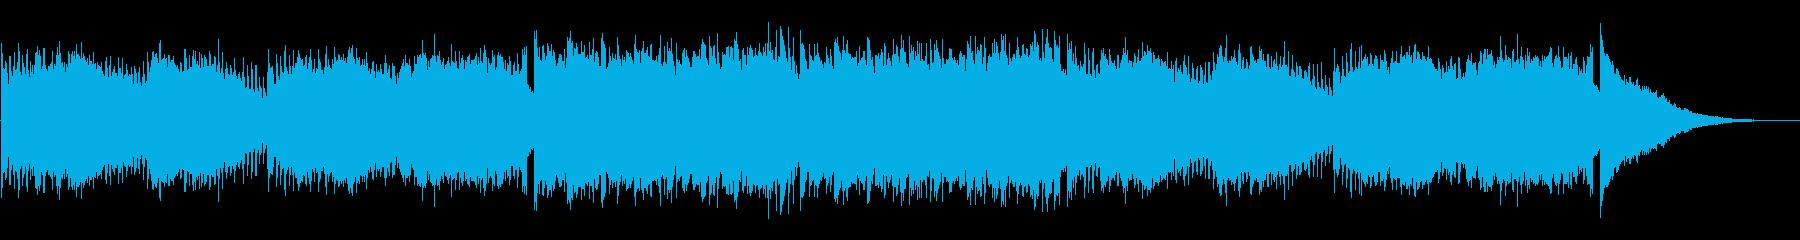 Ending / Painful Acoustic Pops's reproduced waveform